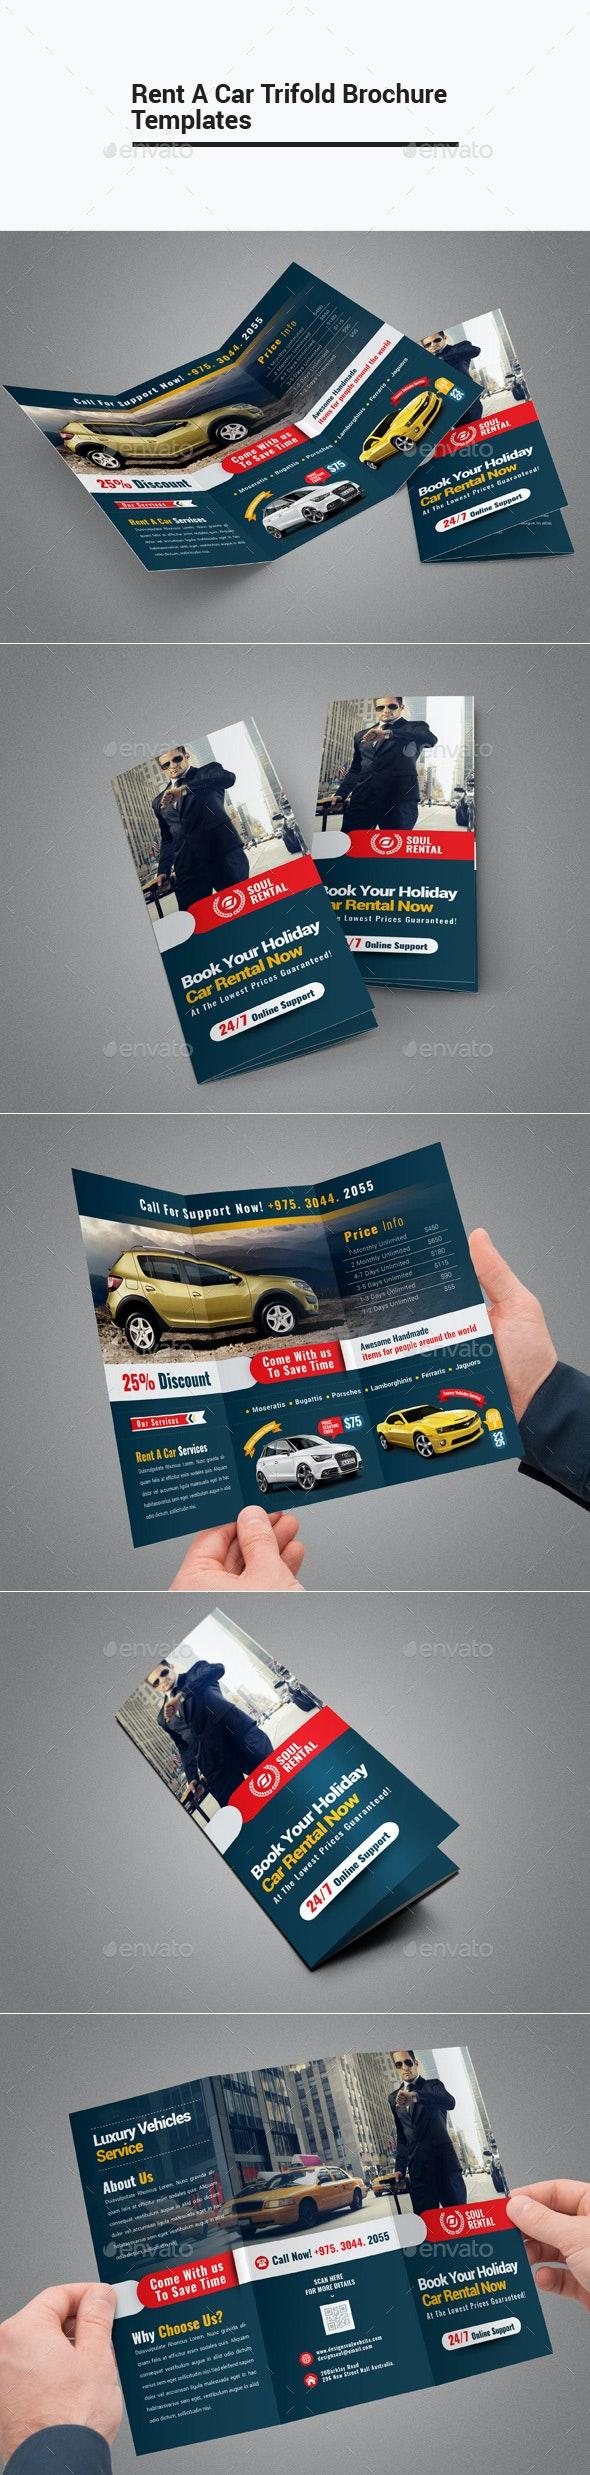 Rent A Car Trifold Brochure - Corporate Brochures